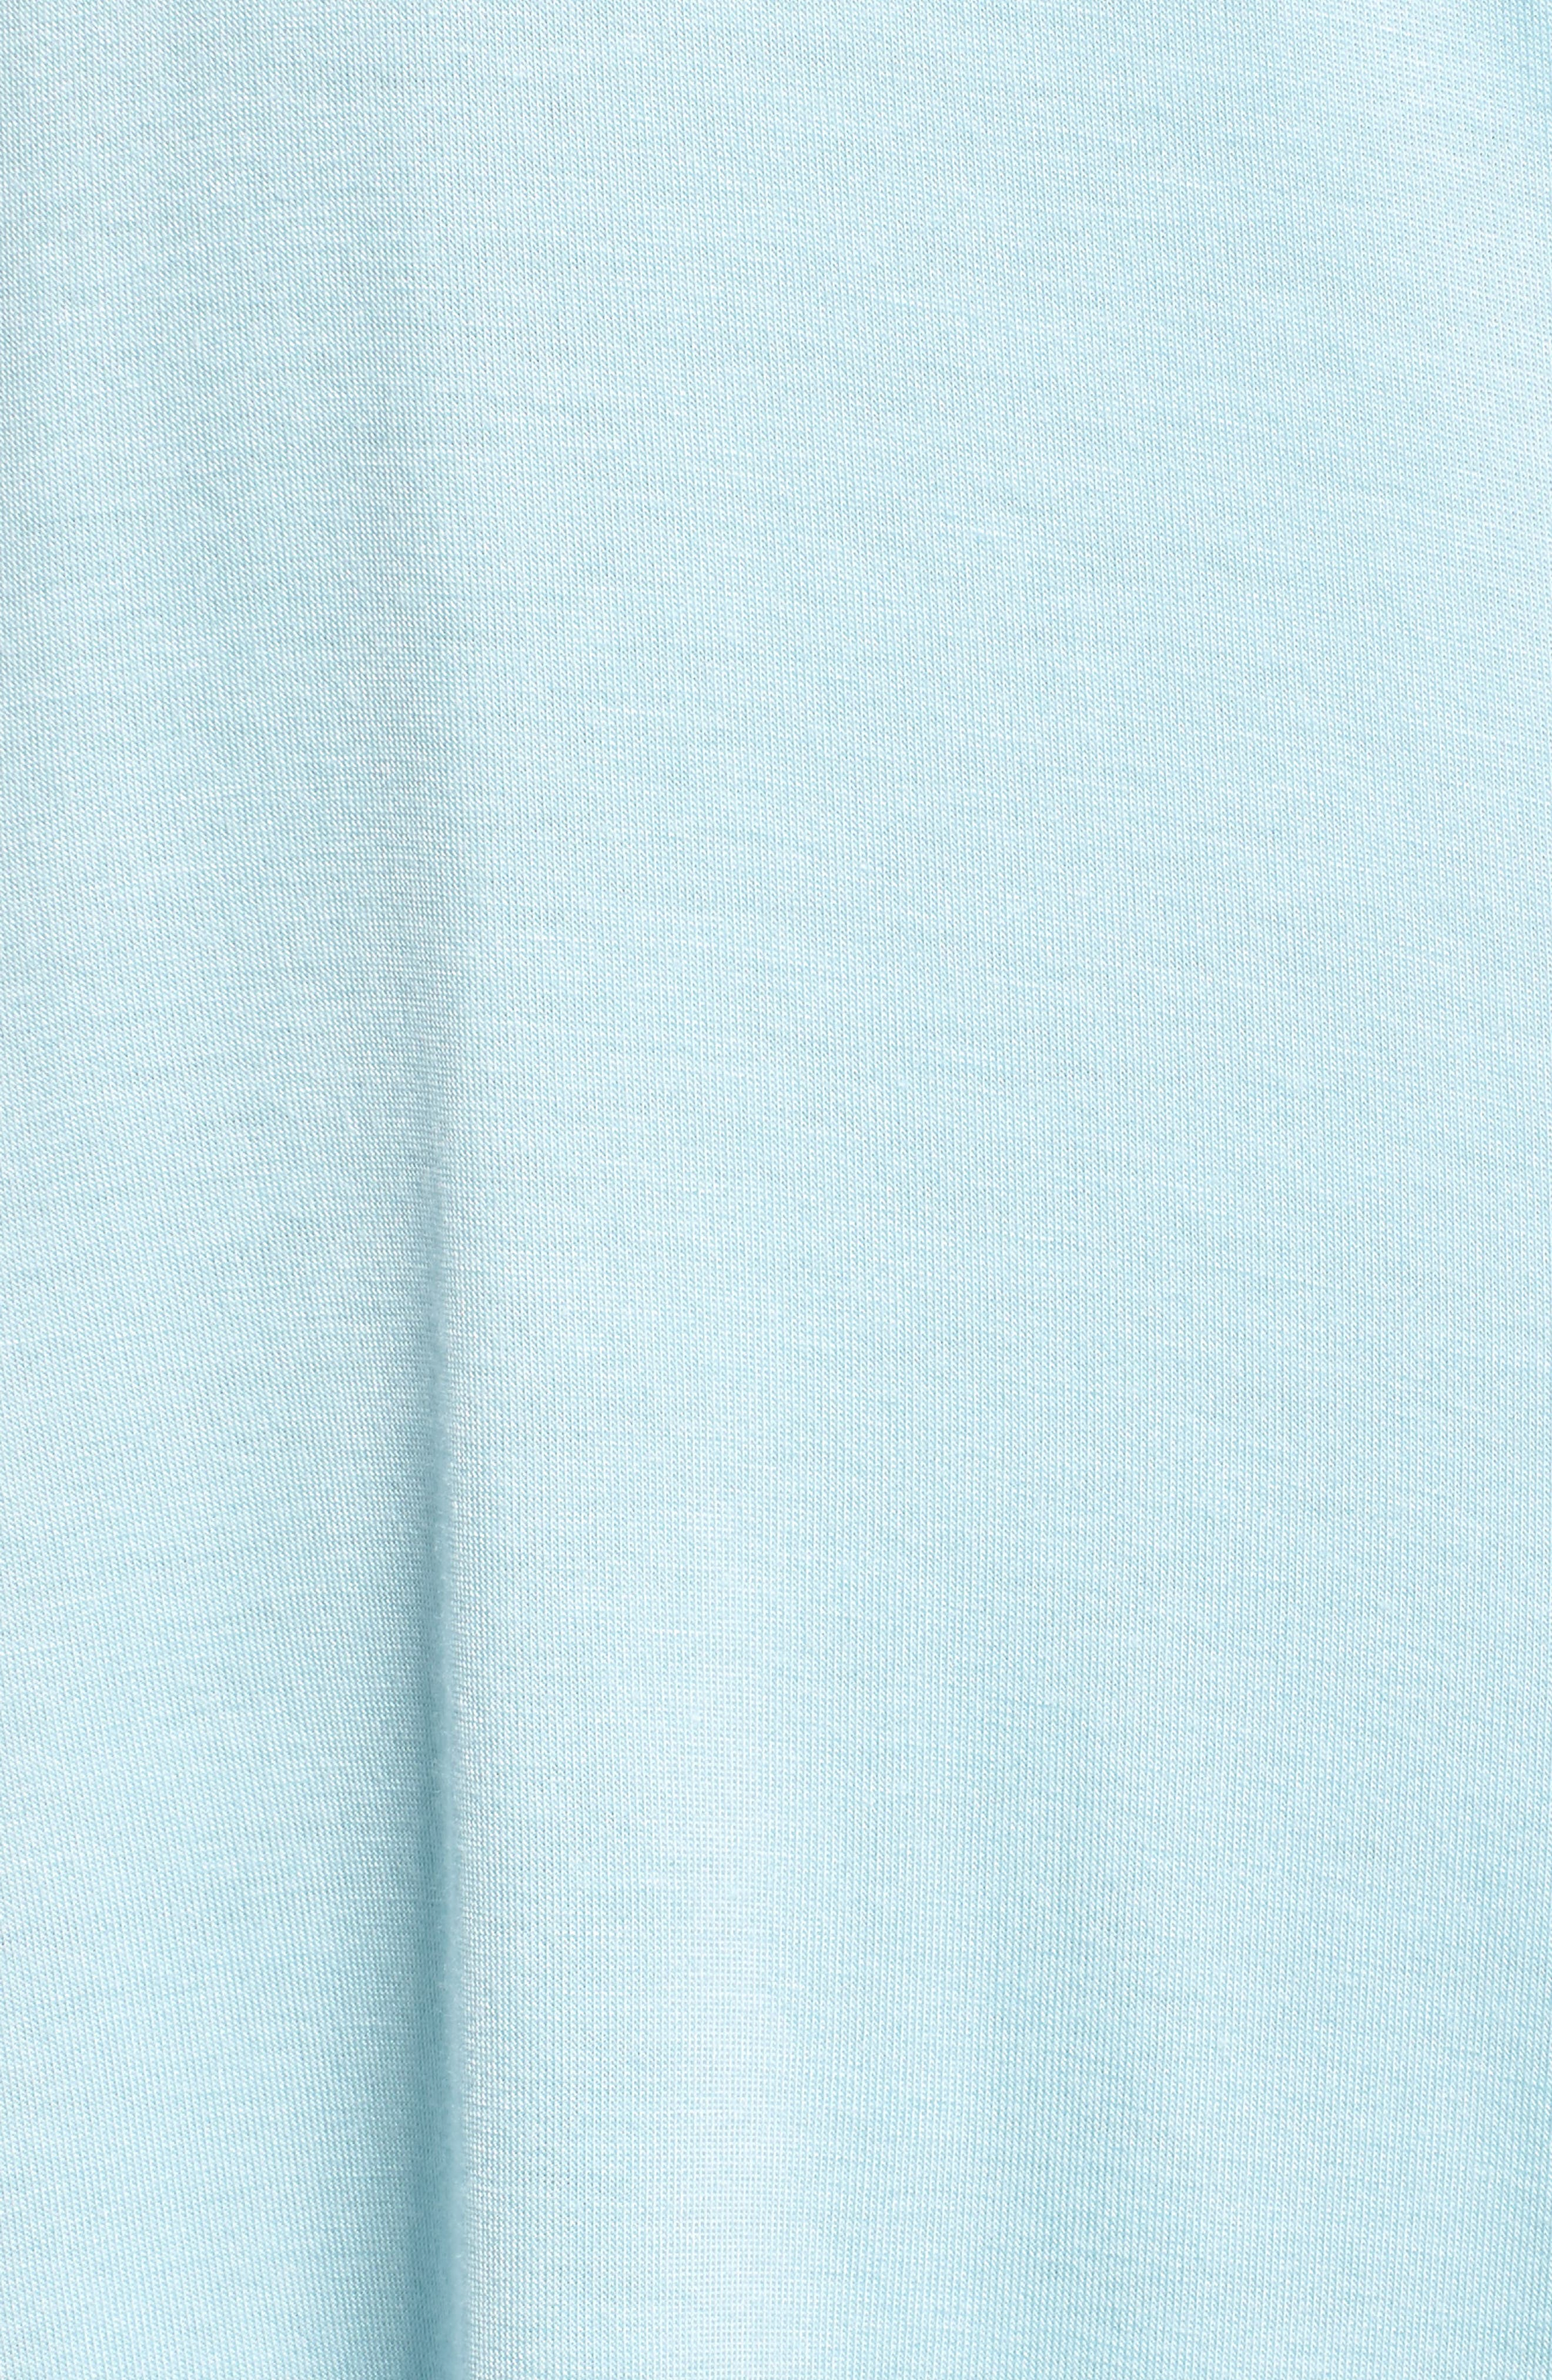 'All American' Sleep Shirt,                             Alternate thumbnail 5, color,                             406